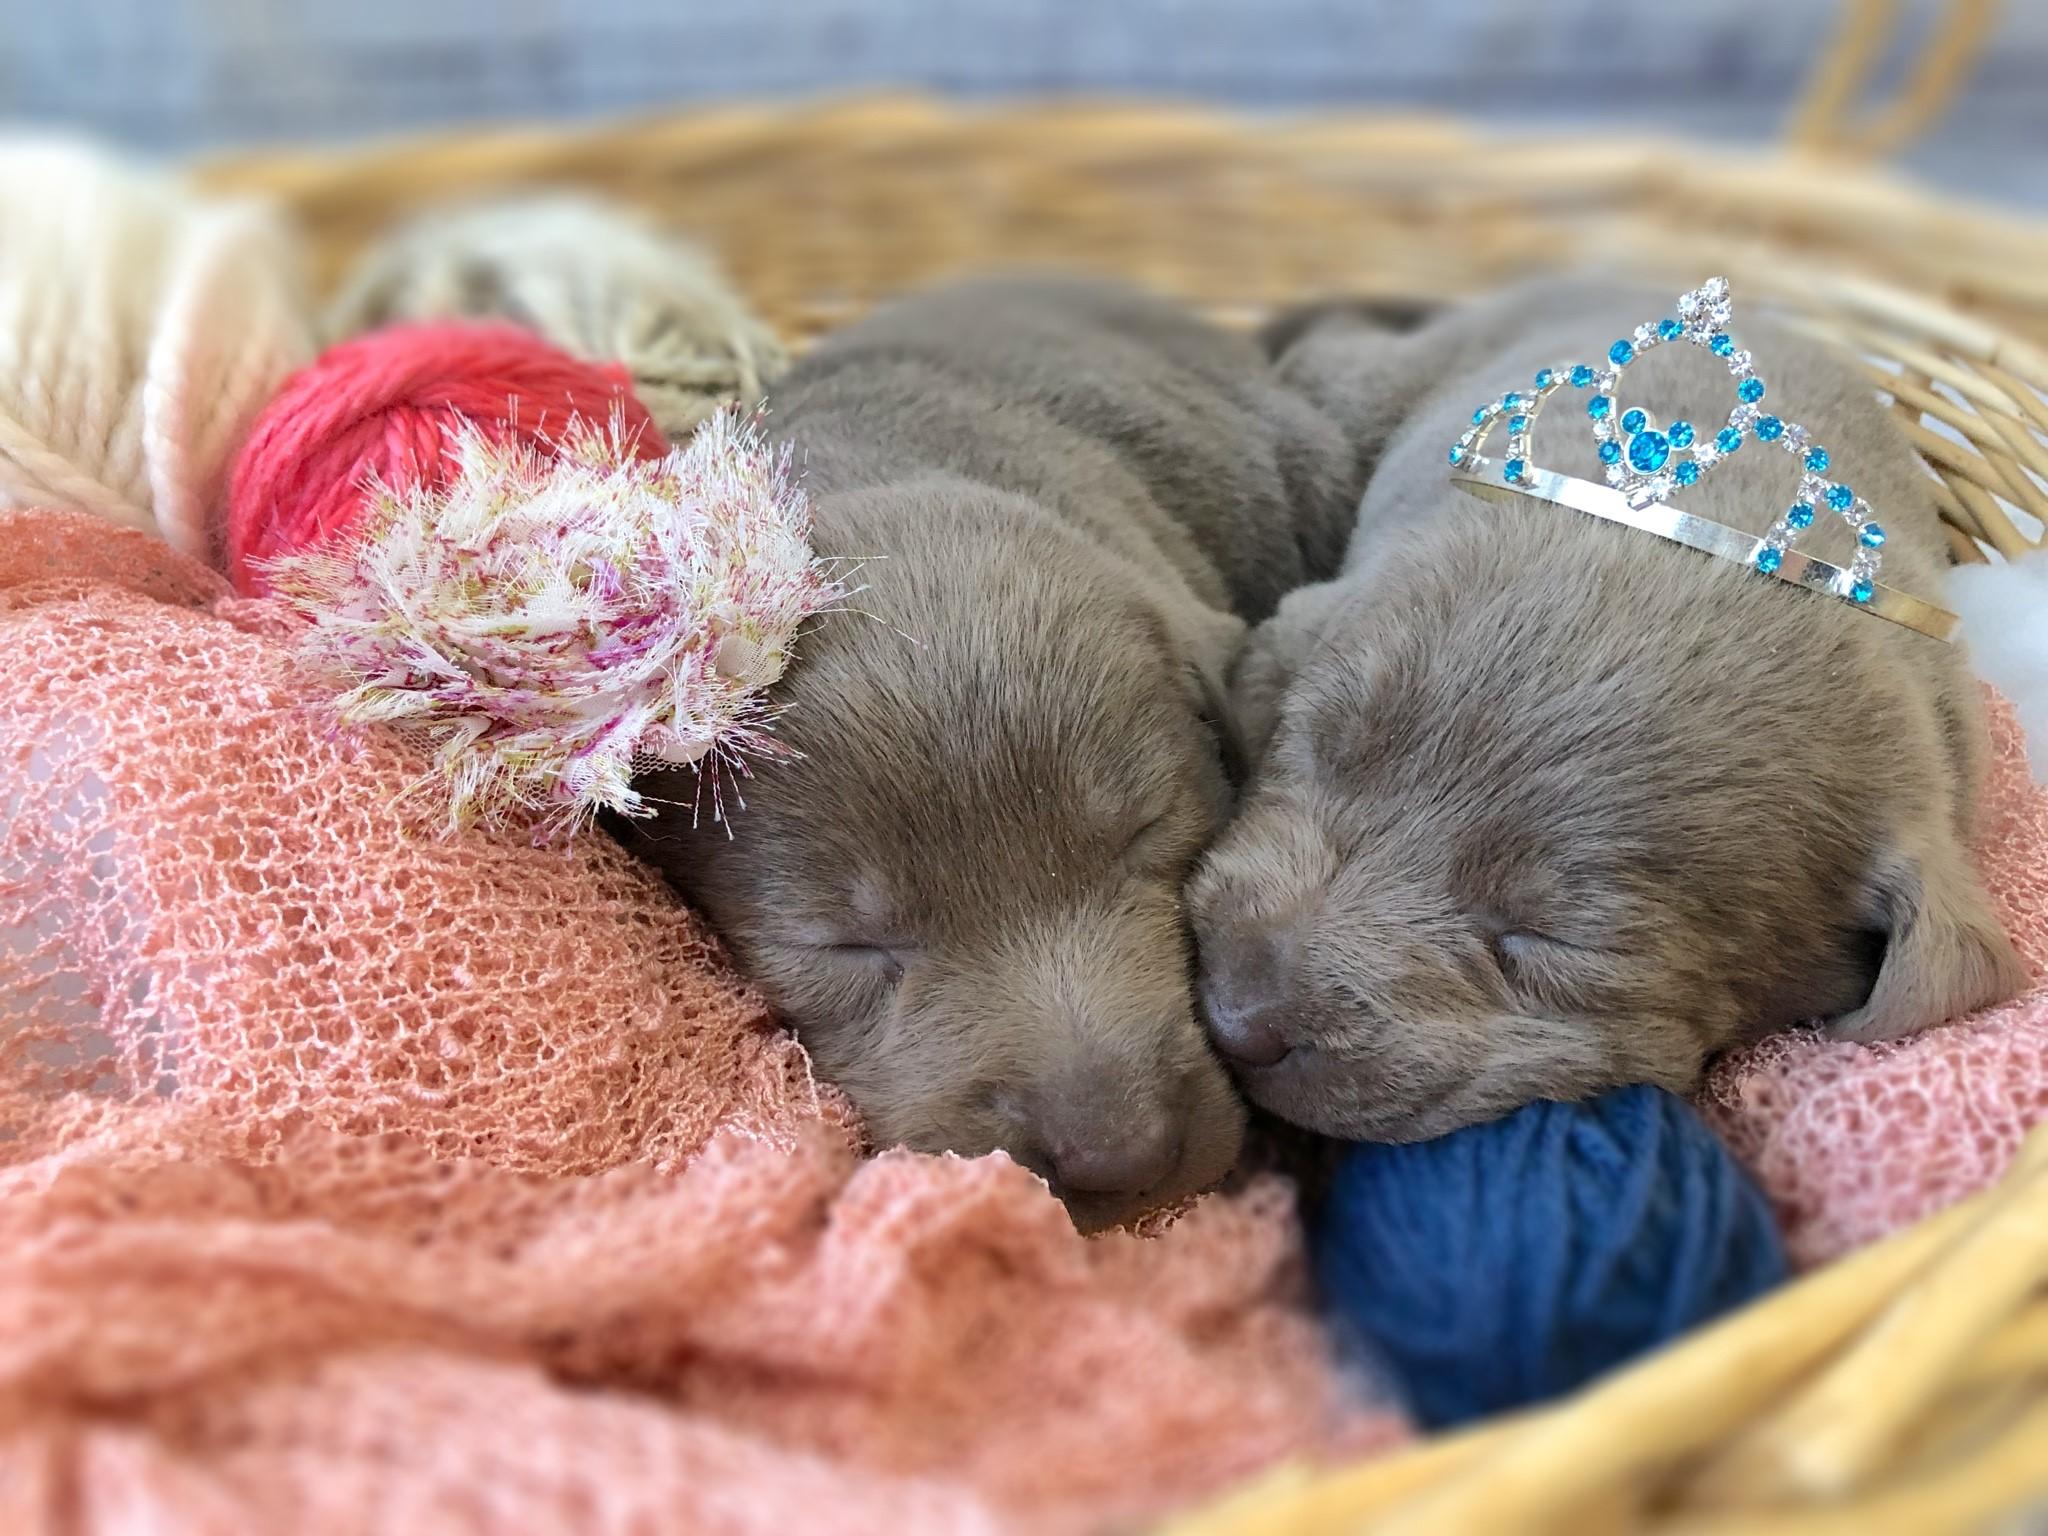 labrador-puppies-sleeping